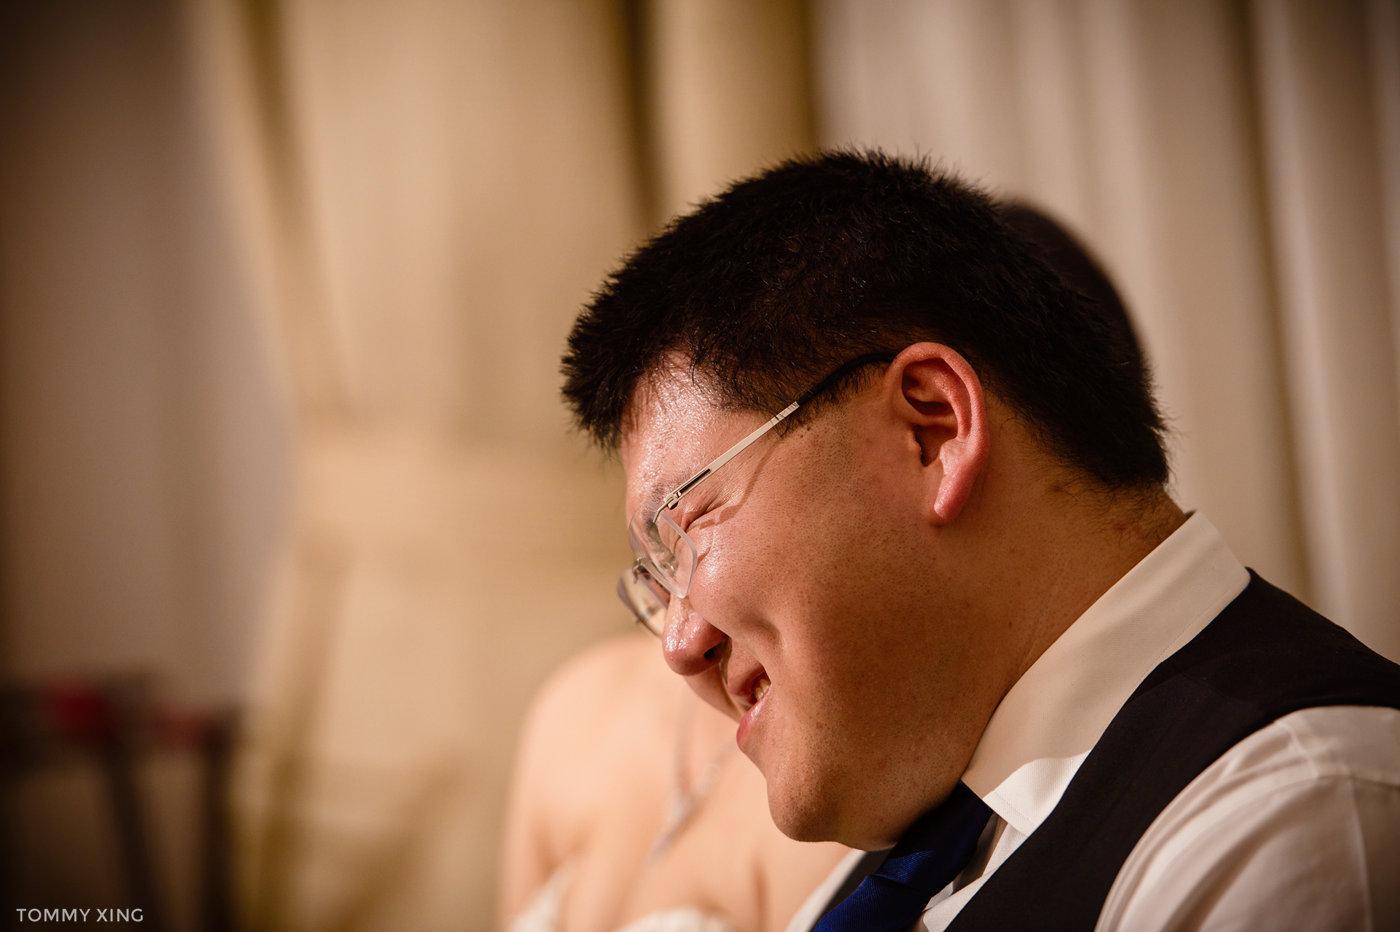 STANFORD MEMORIAL CHURCH WEDDING - Wenjie & Chengcheng - SAN FRANCISCO BAY AREA 斯坦福教堂婚礼跟拍 - 洛杉矶婚礼婚纱照摄影师 Tommy Xing Photography205.jpg